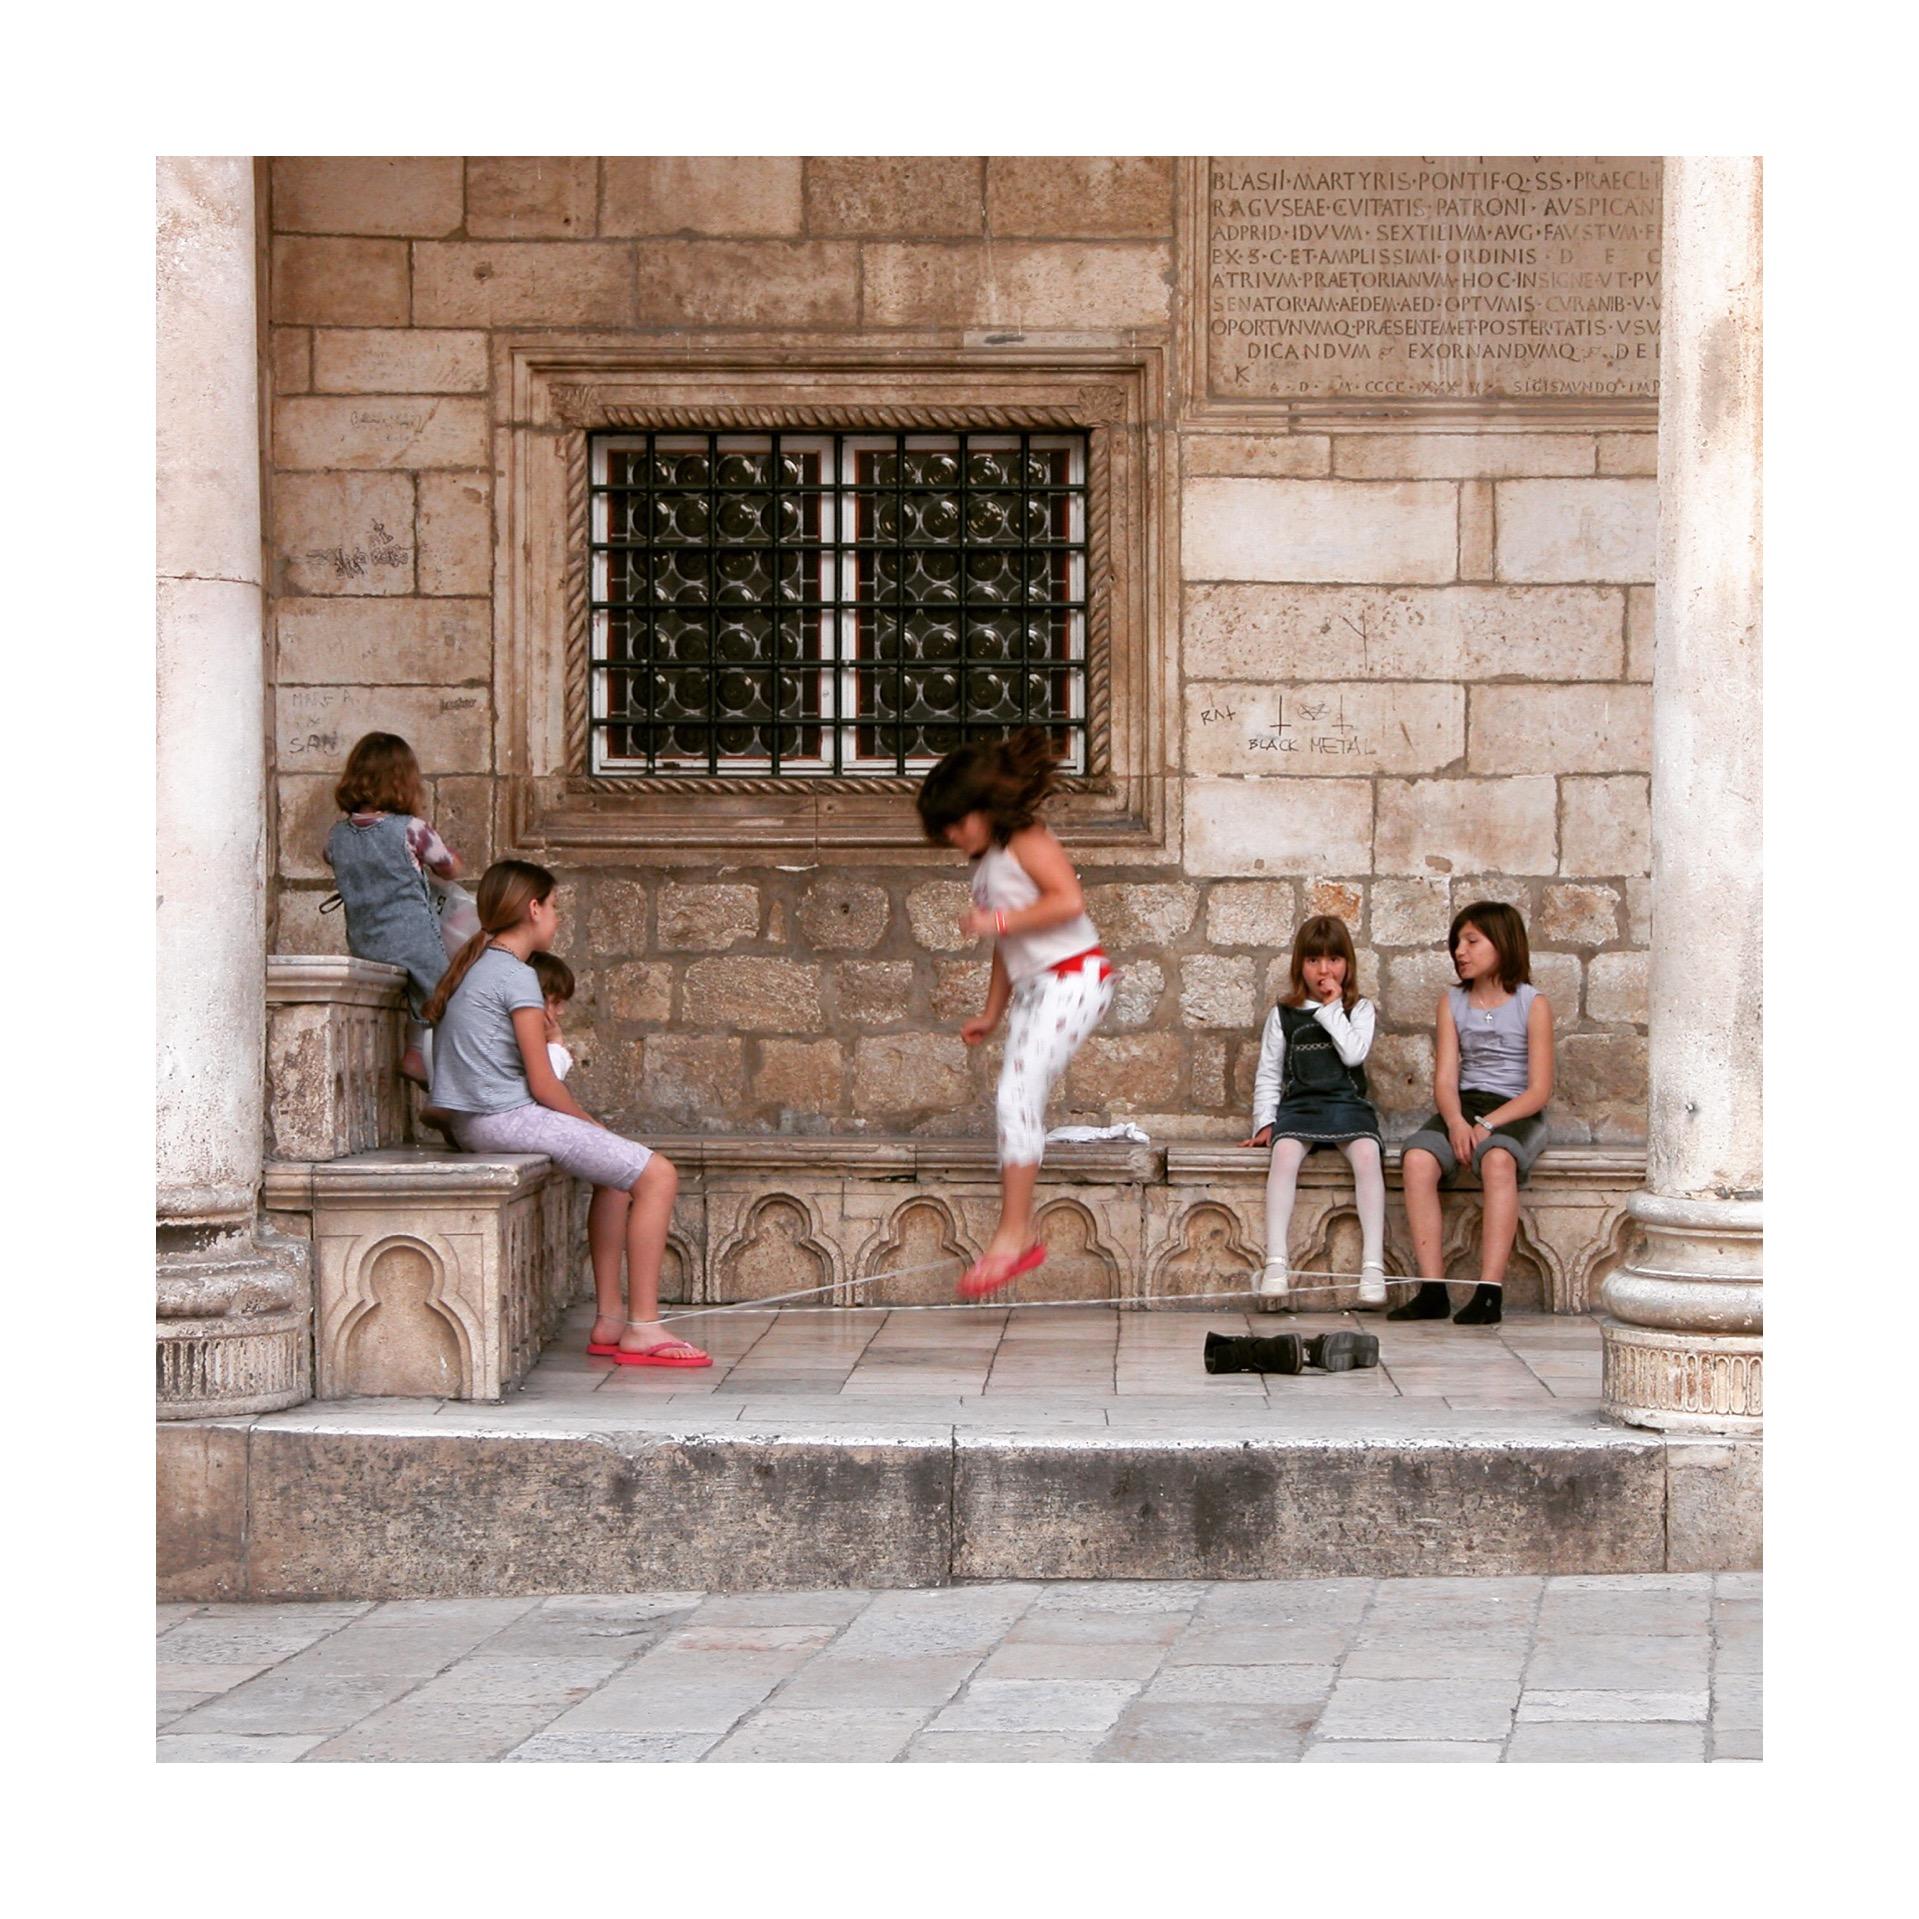 Dubrovnik, 2004.